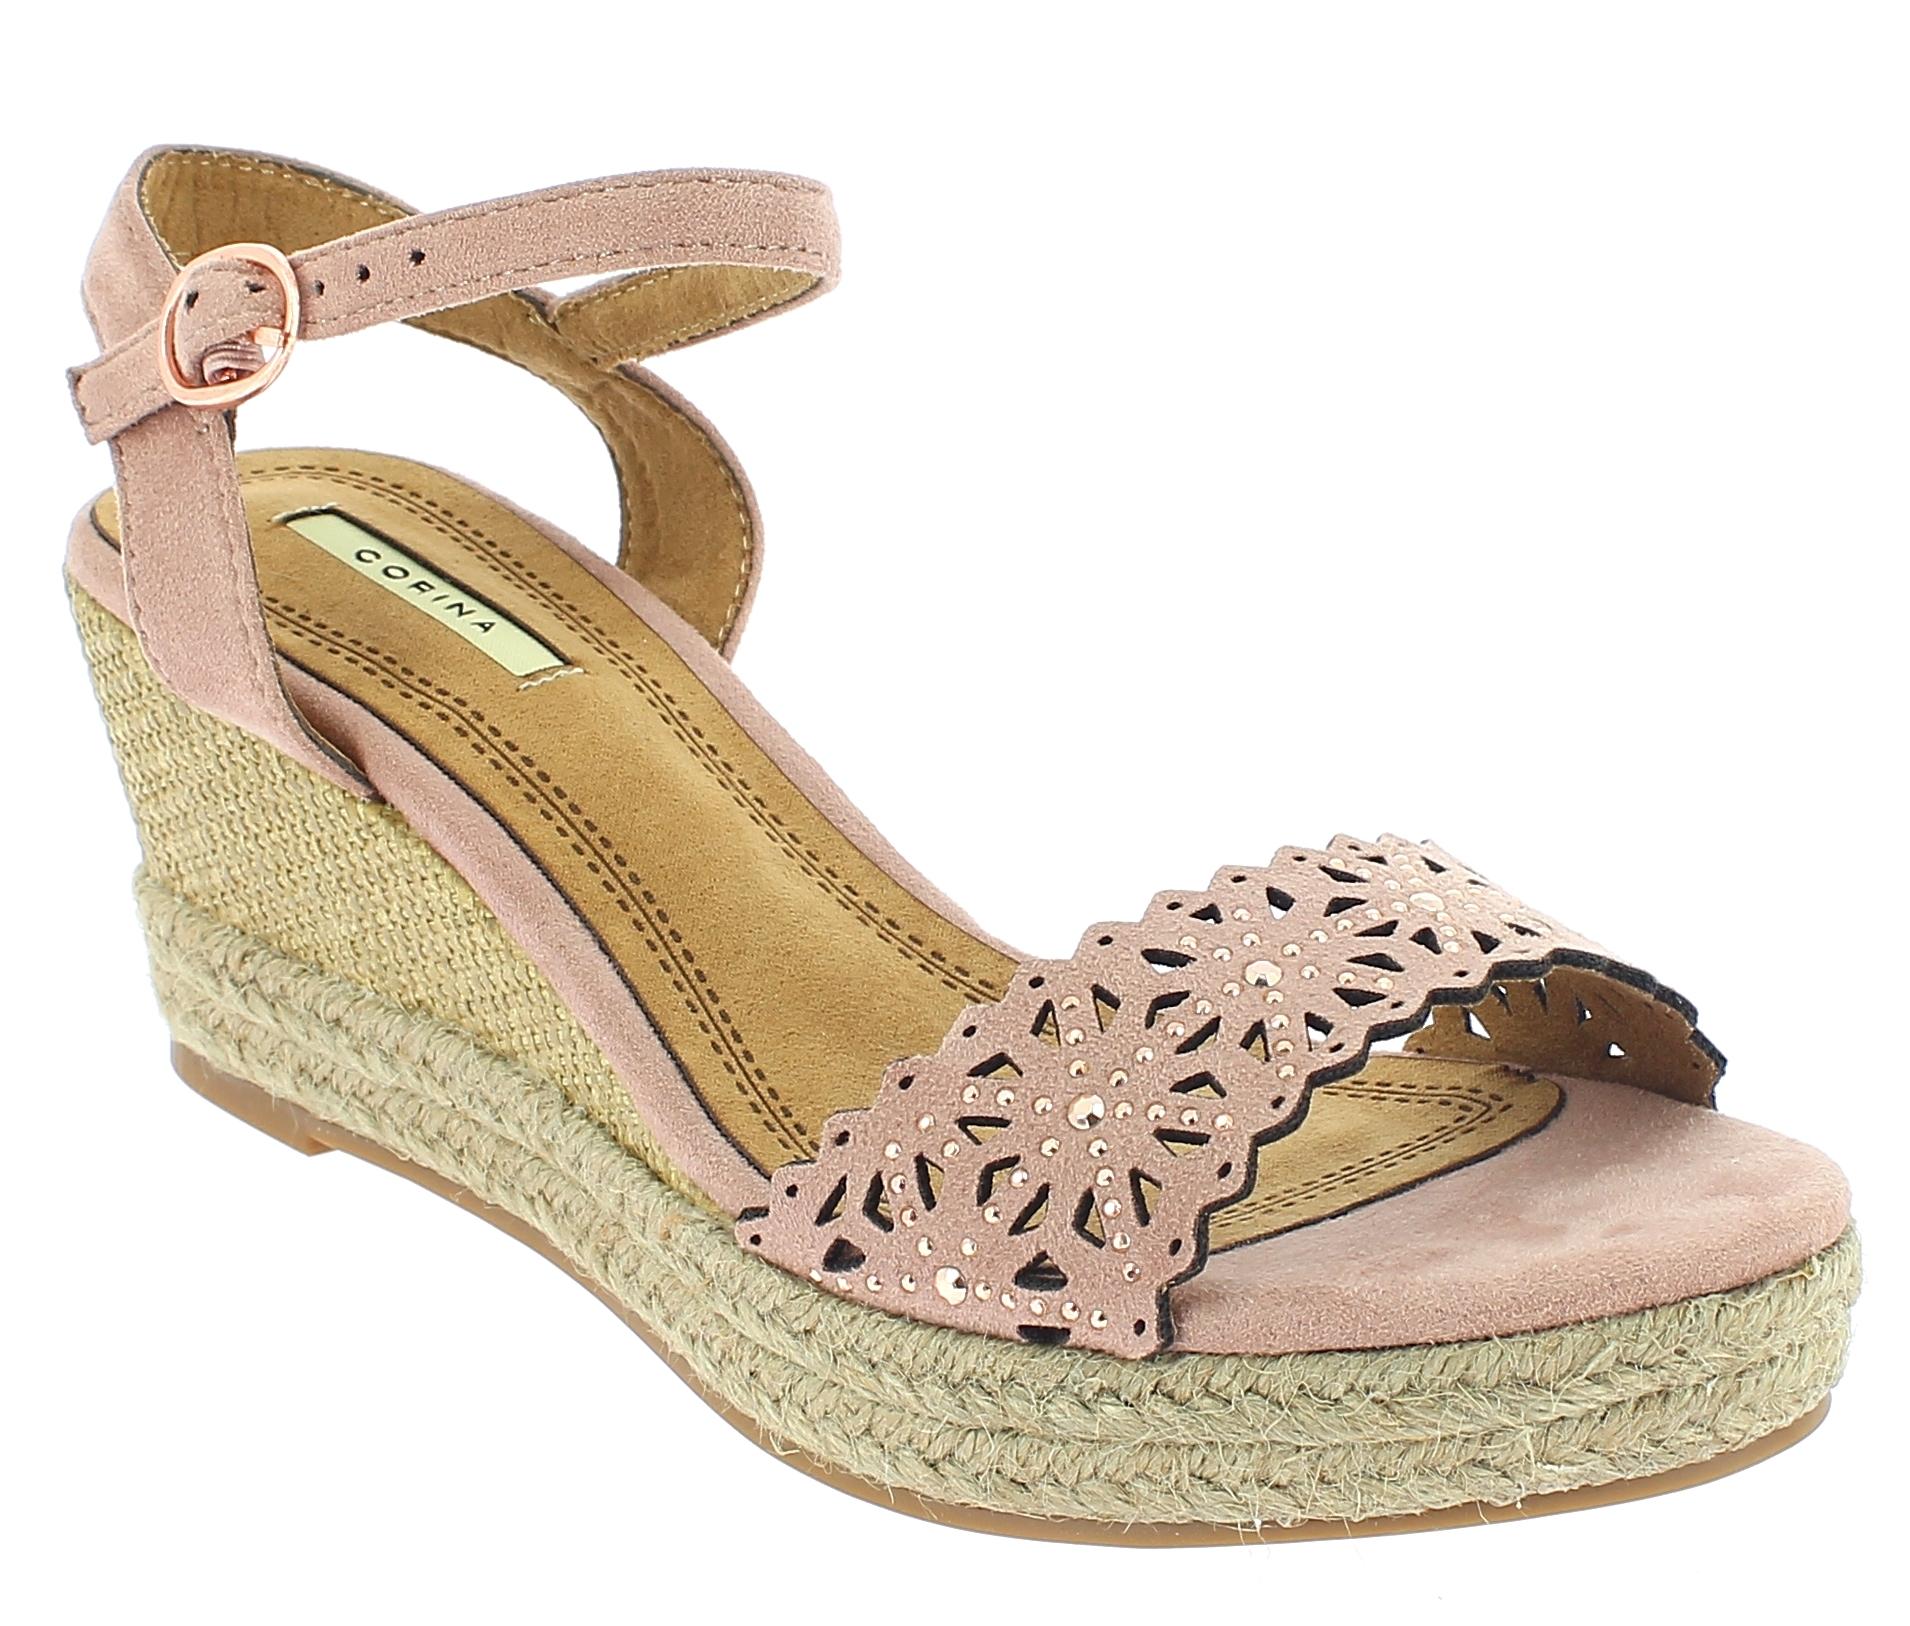 CORINA Γυναικεία Πλατφόρμα C8371 Ροζ - IqShoes - C8371 ROSA-CORINA-pink-40/1/11/ παπούτσια  new in